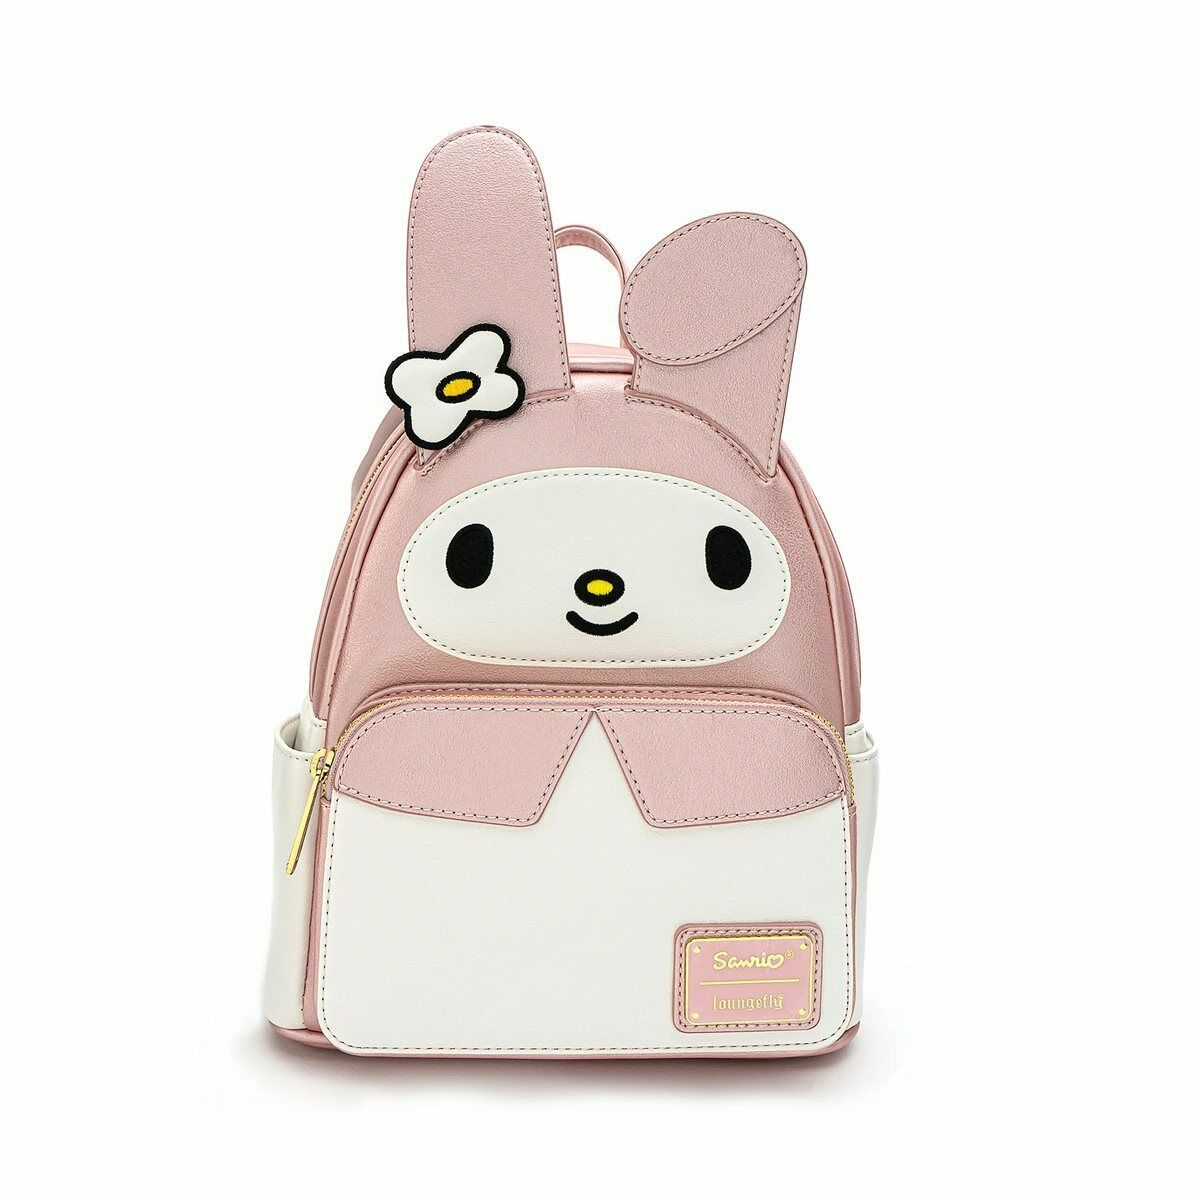 Loungefly Sanrio Hello Kitty My Melody Cosplay Mini Backpack - $159.99